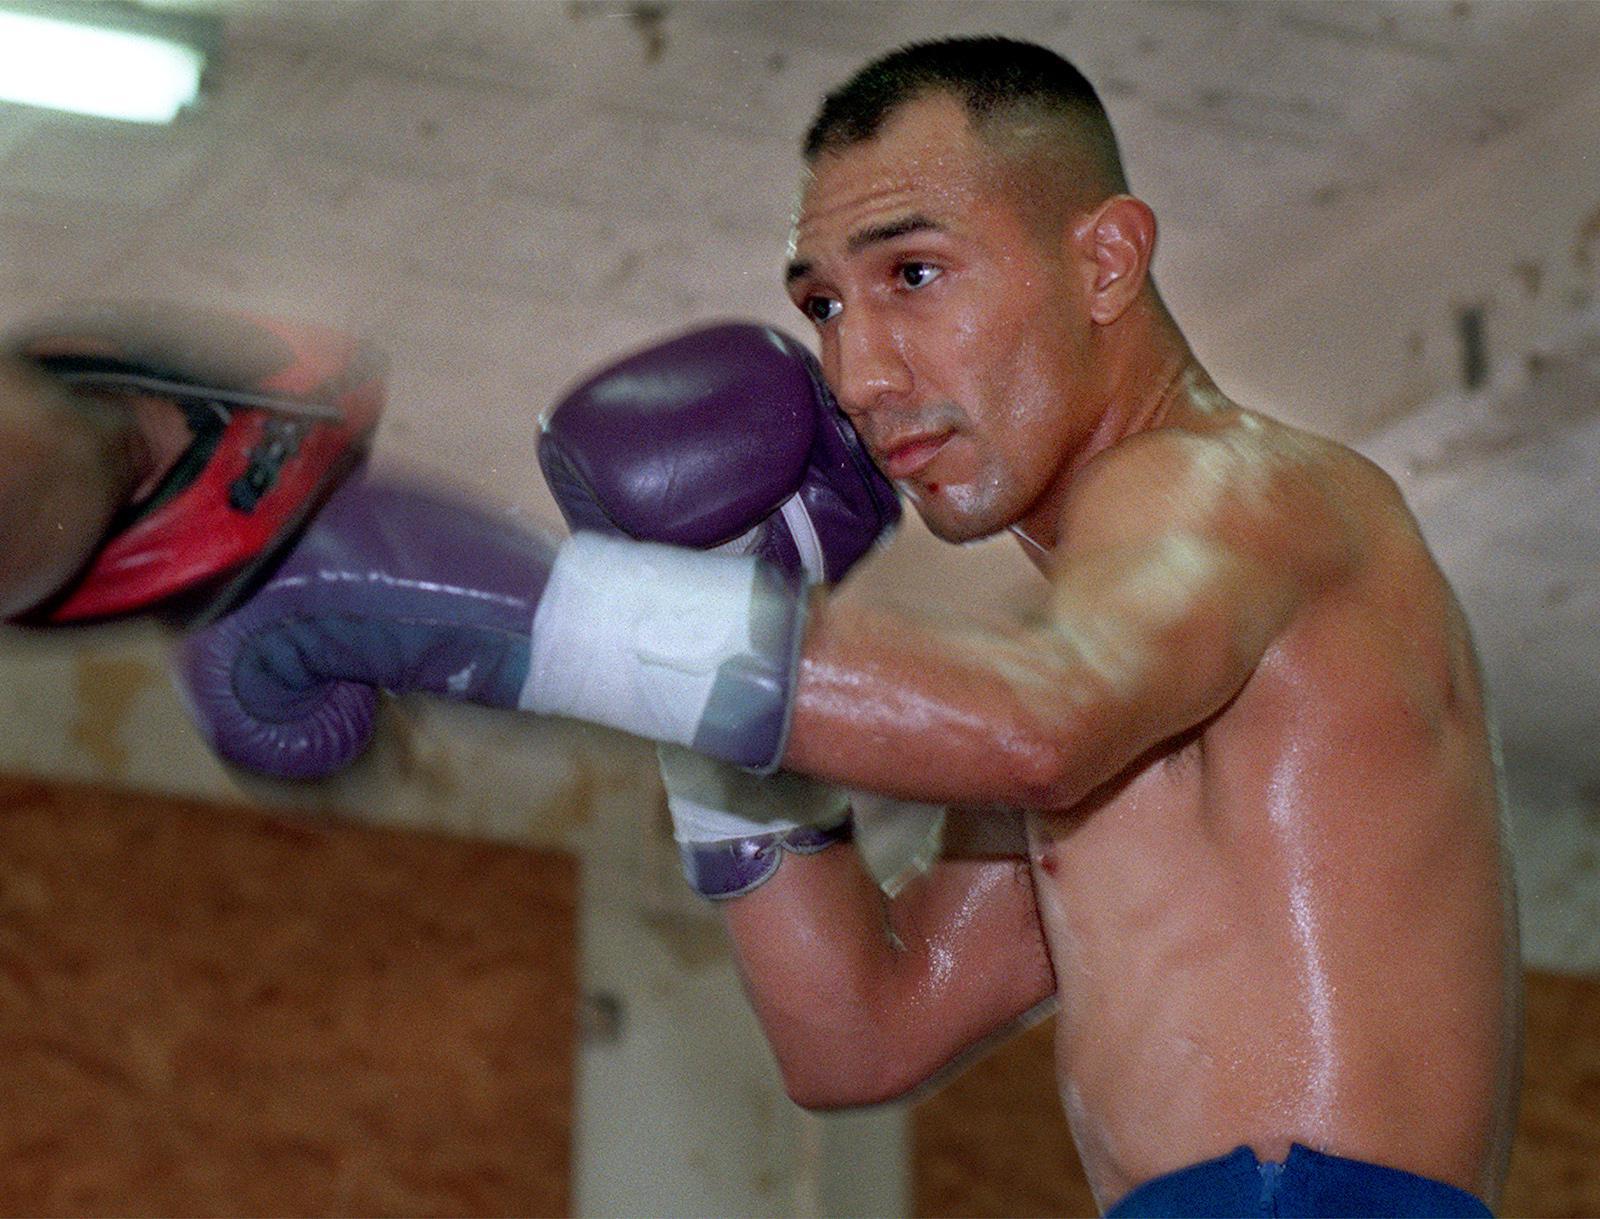 Alexis Texas Boxing john michael johnson to attempt comeback - expressnews